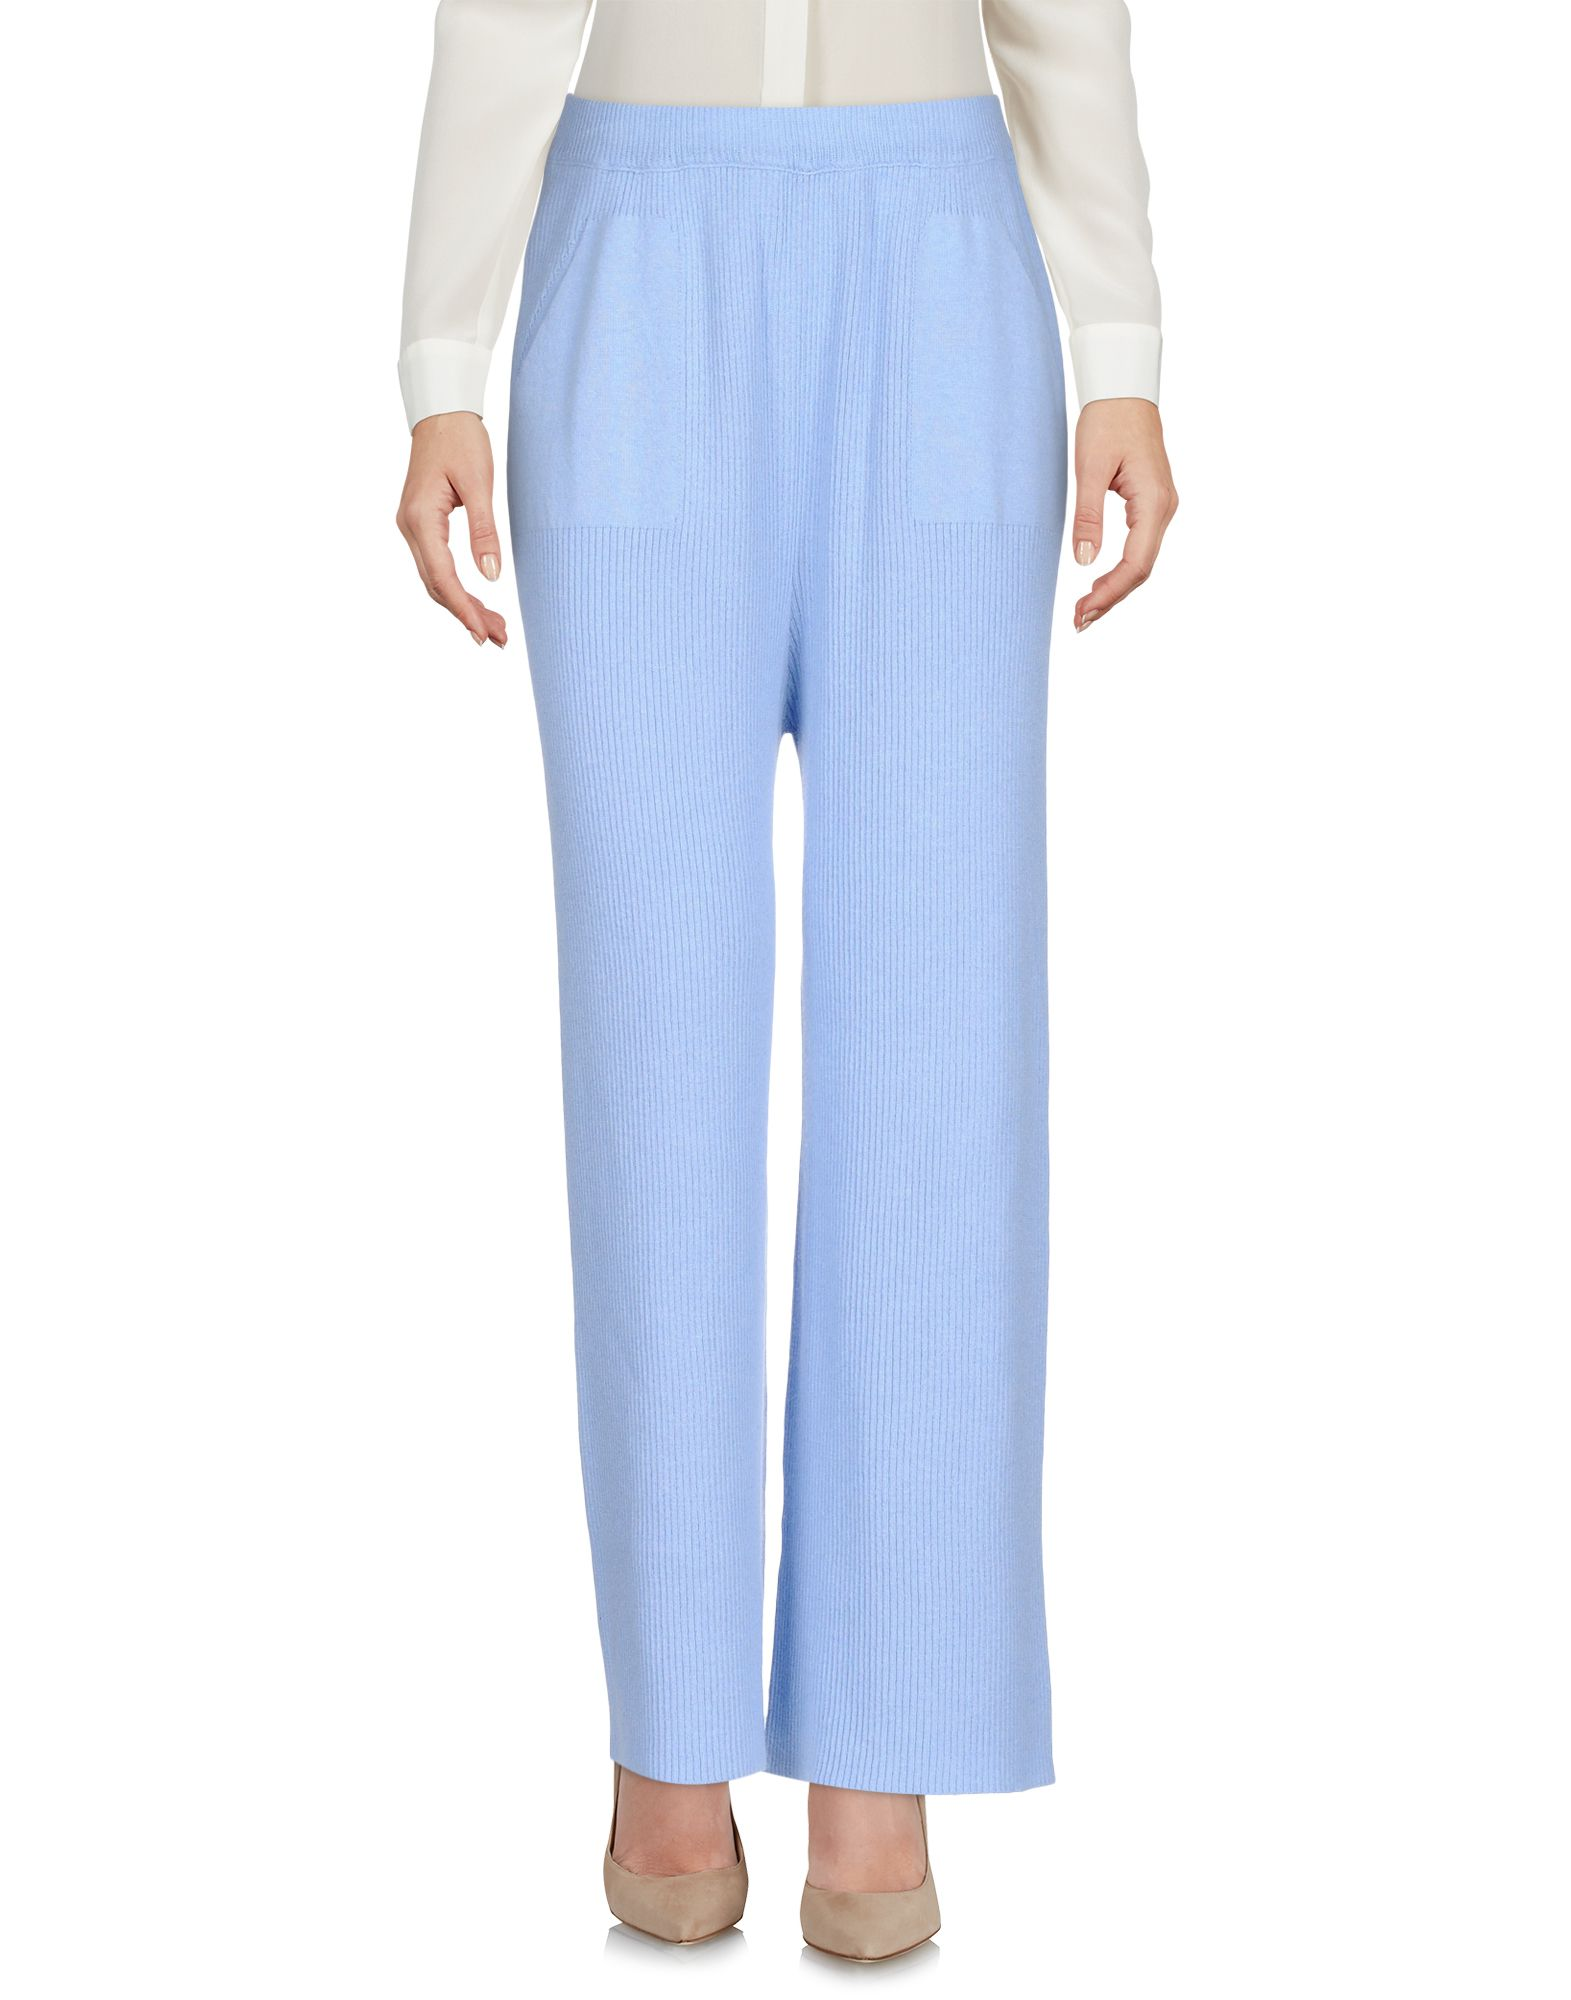 CHIARA BERTANI Повседневные брюки три четверти брюки moda di chiara брюки широкие